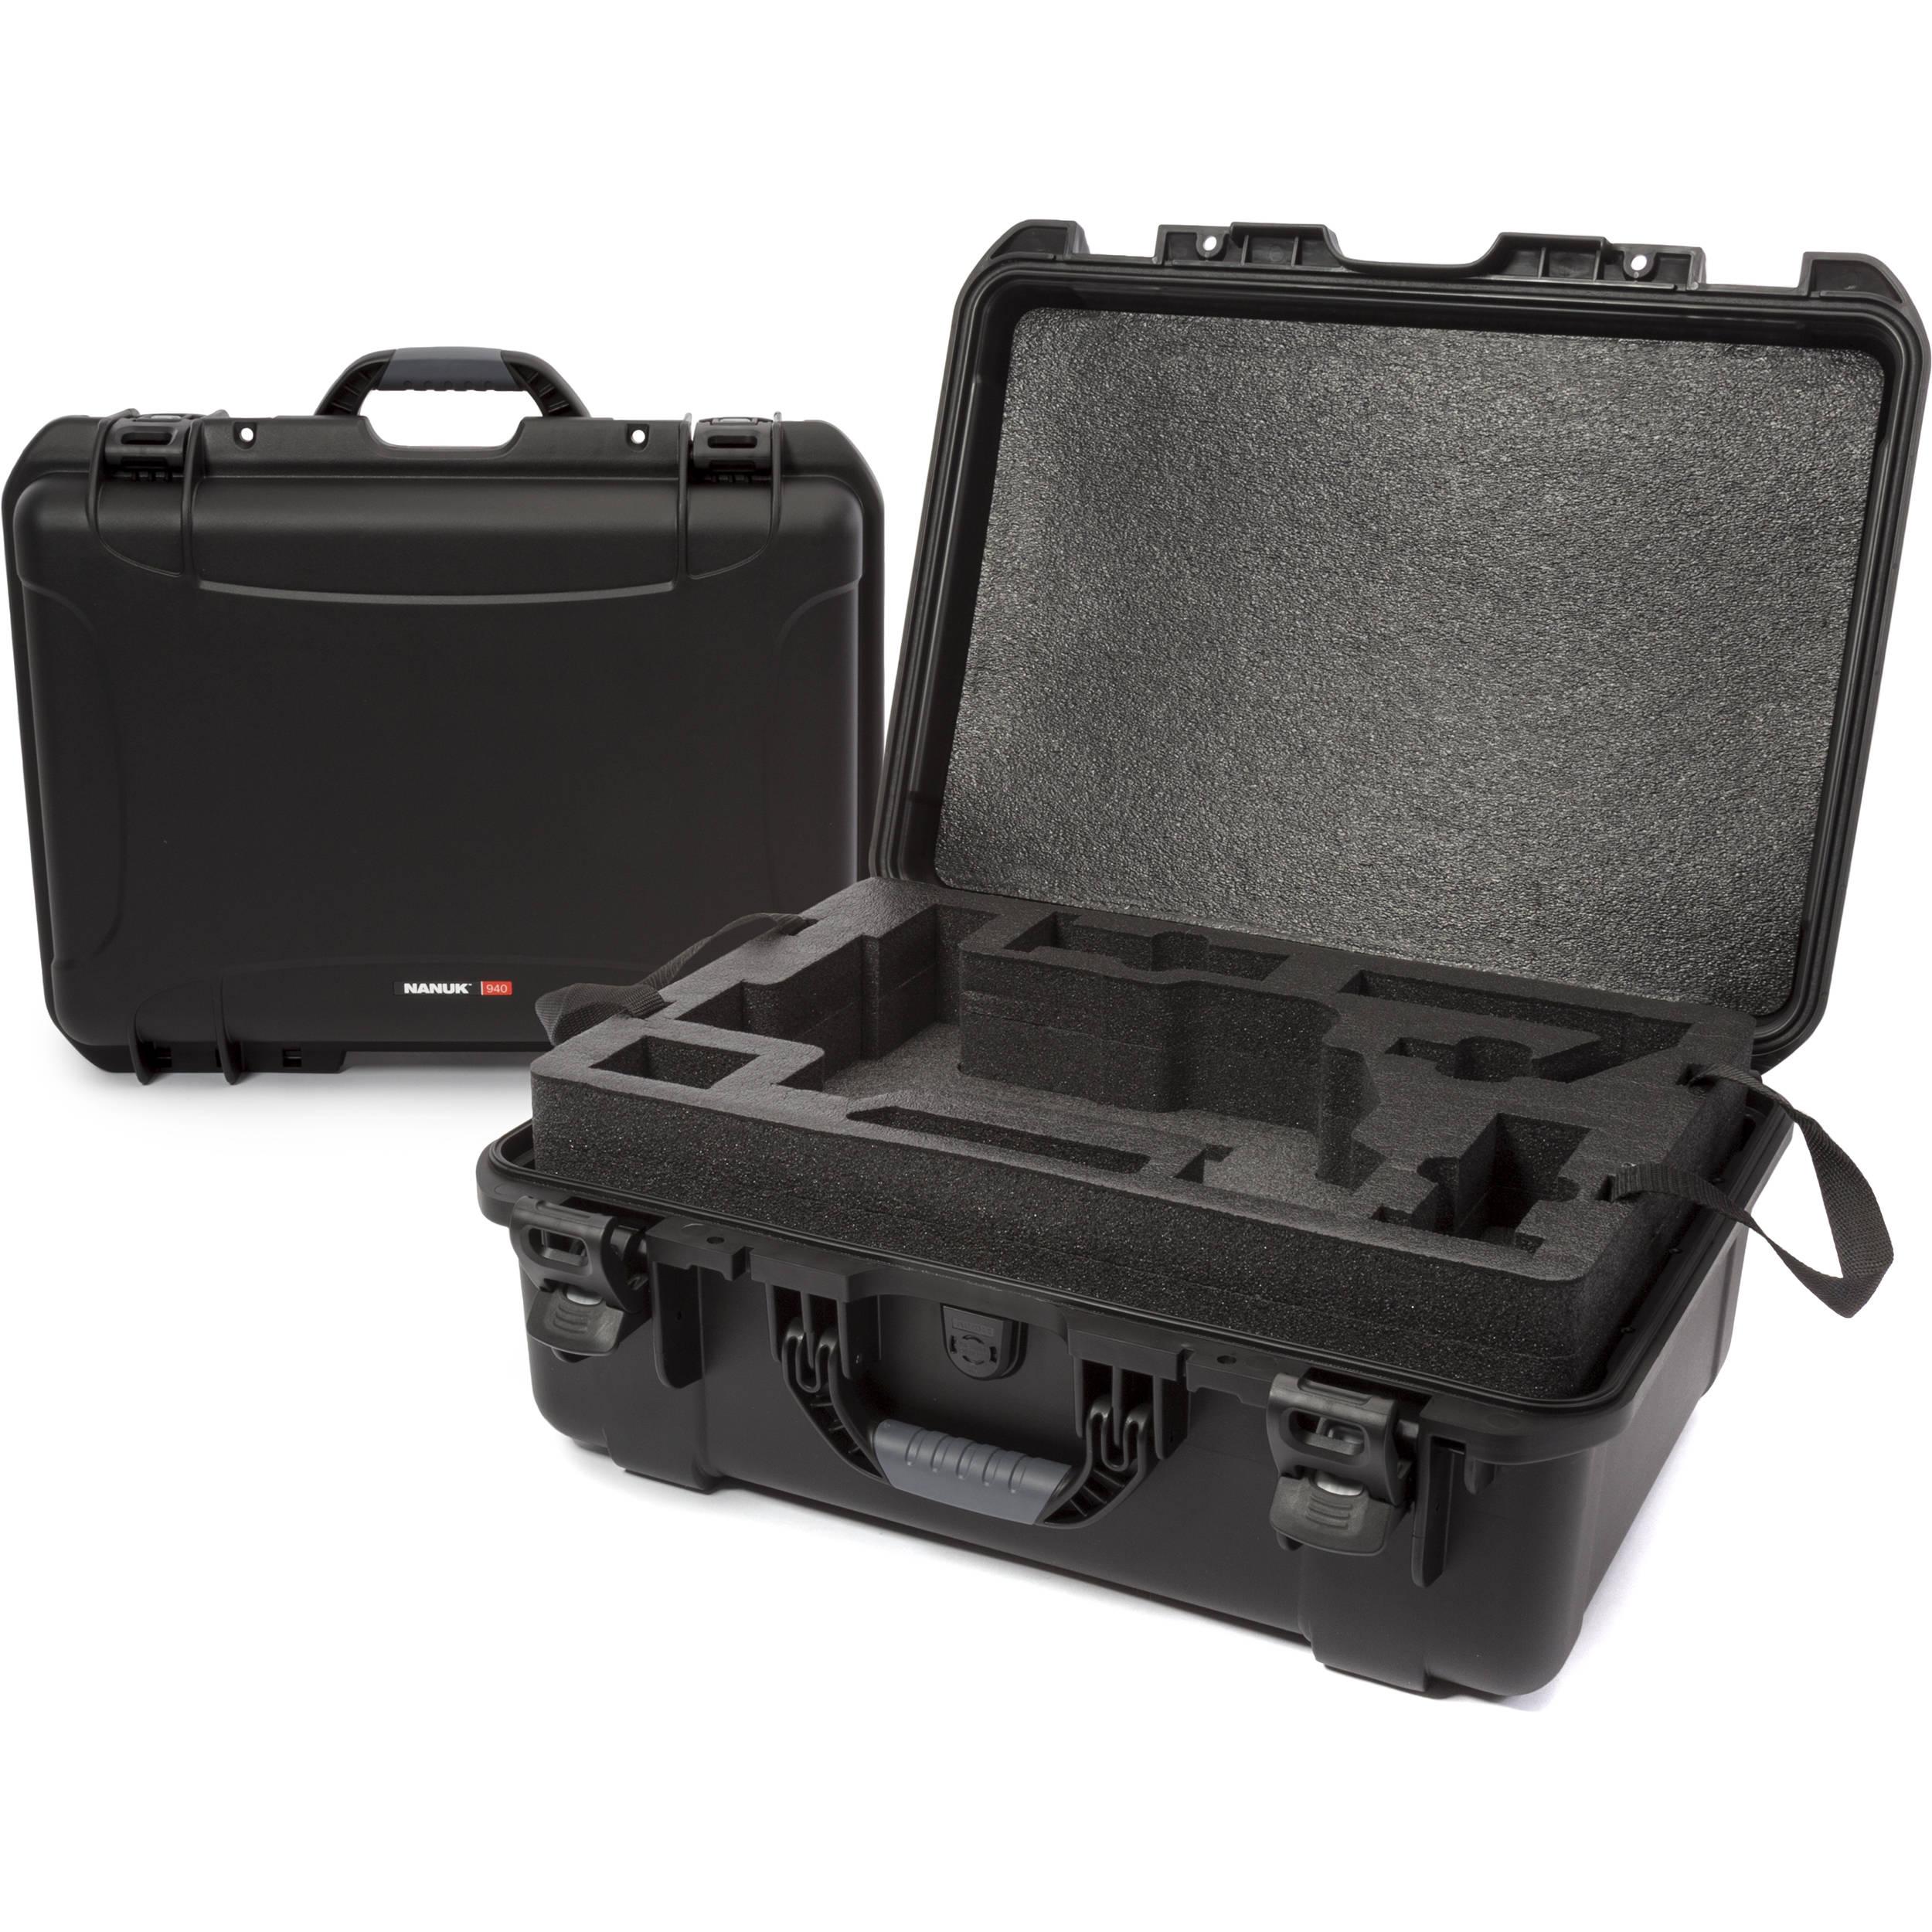 sperian multipro gas detector manual